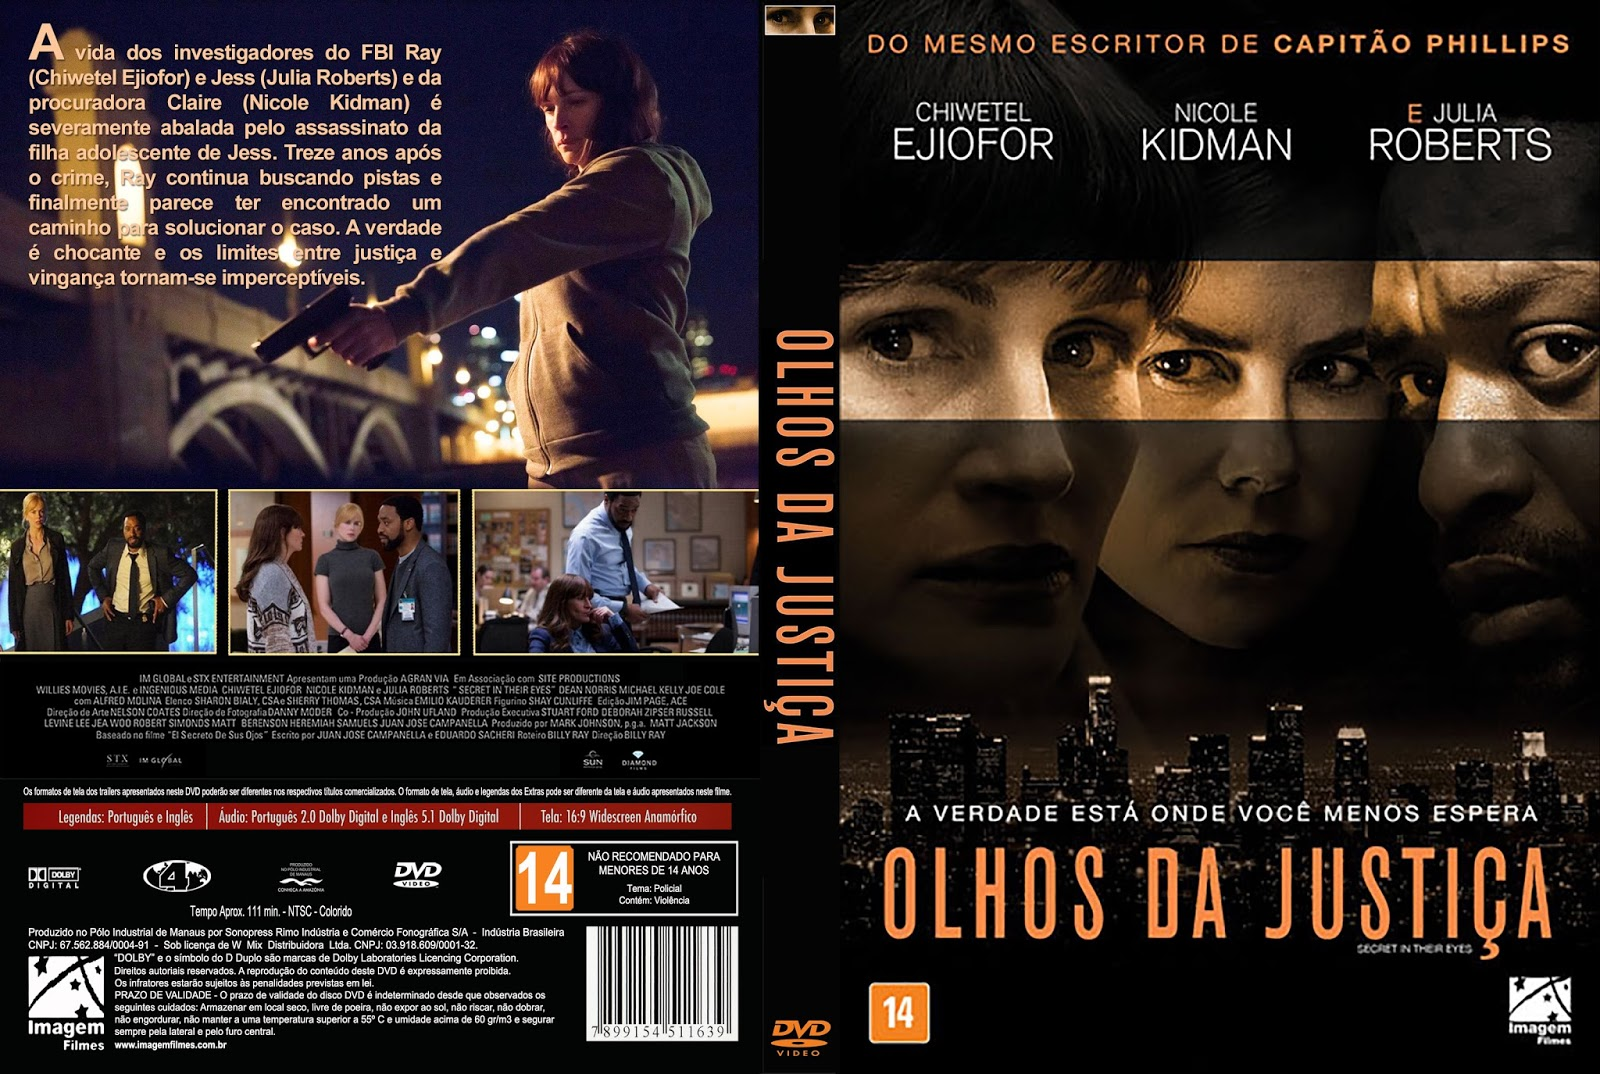 Olhos da Justiça DVD-R Olhos 2Bda 2BJusti 25C3 25A7a 2BDVD R 2BXANDAODOWNLOAD